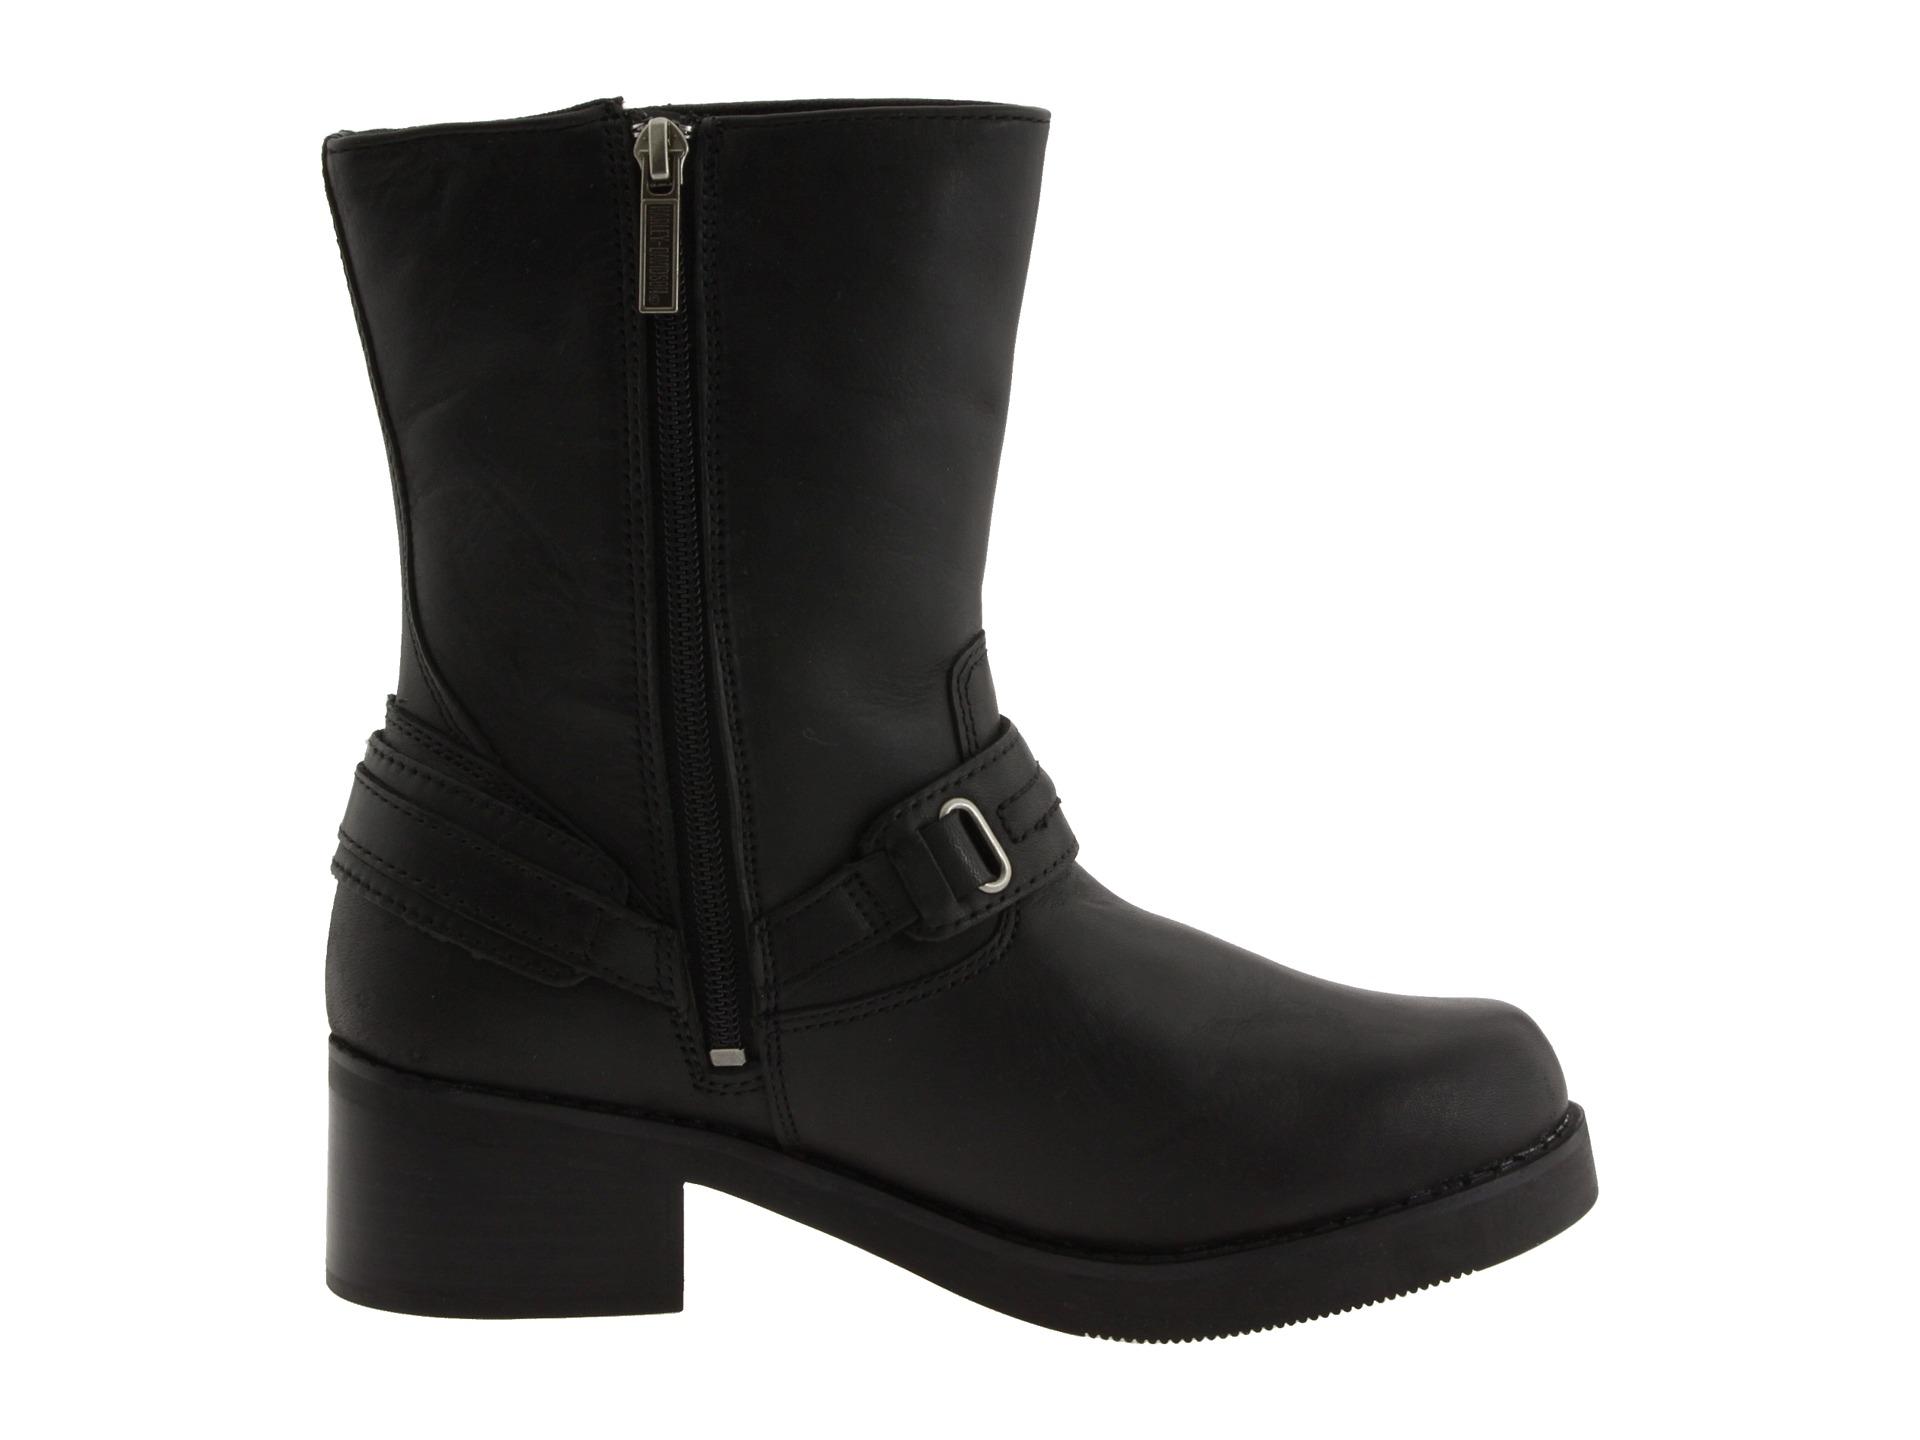 Harley davidson christa boot zappos com free shipping both ways